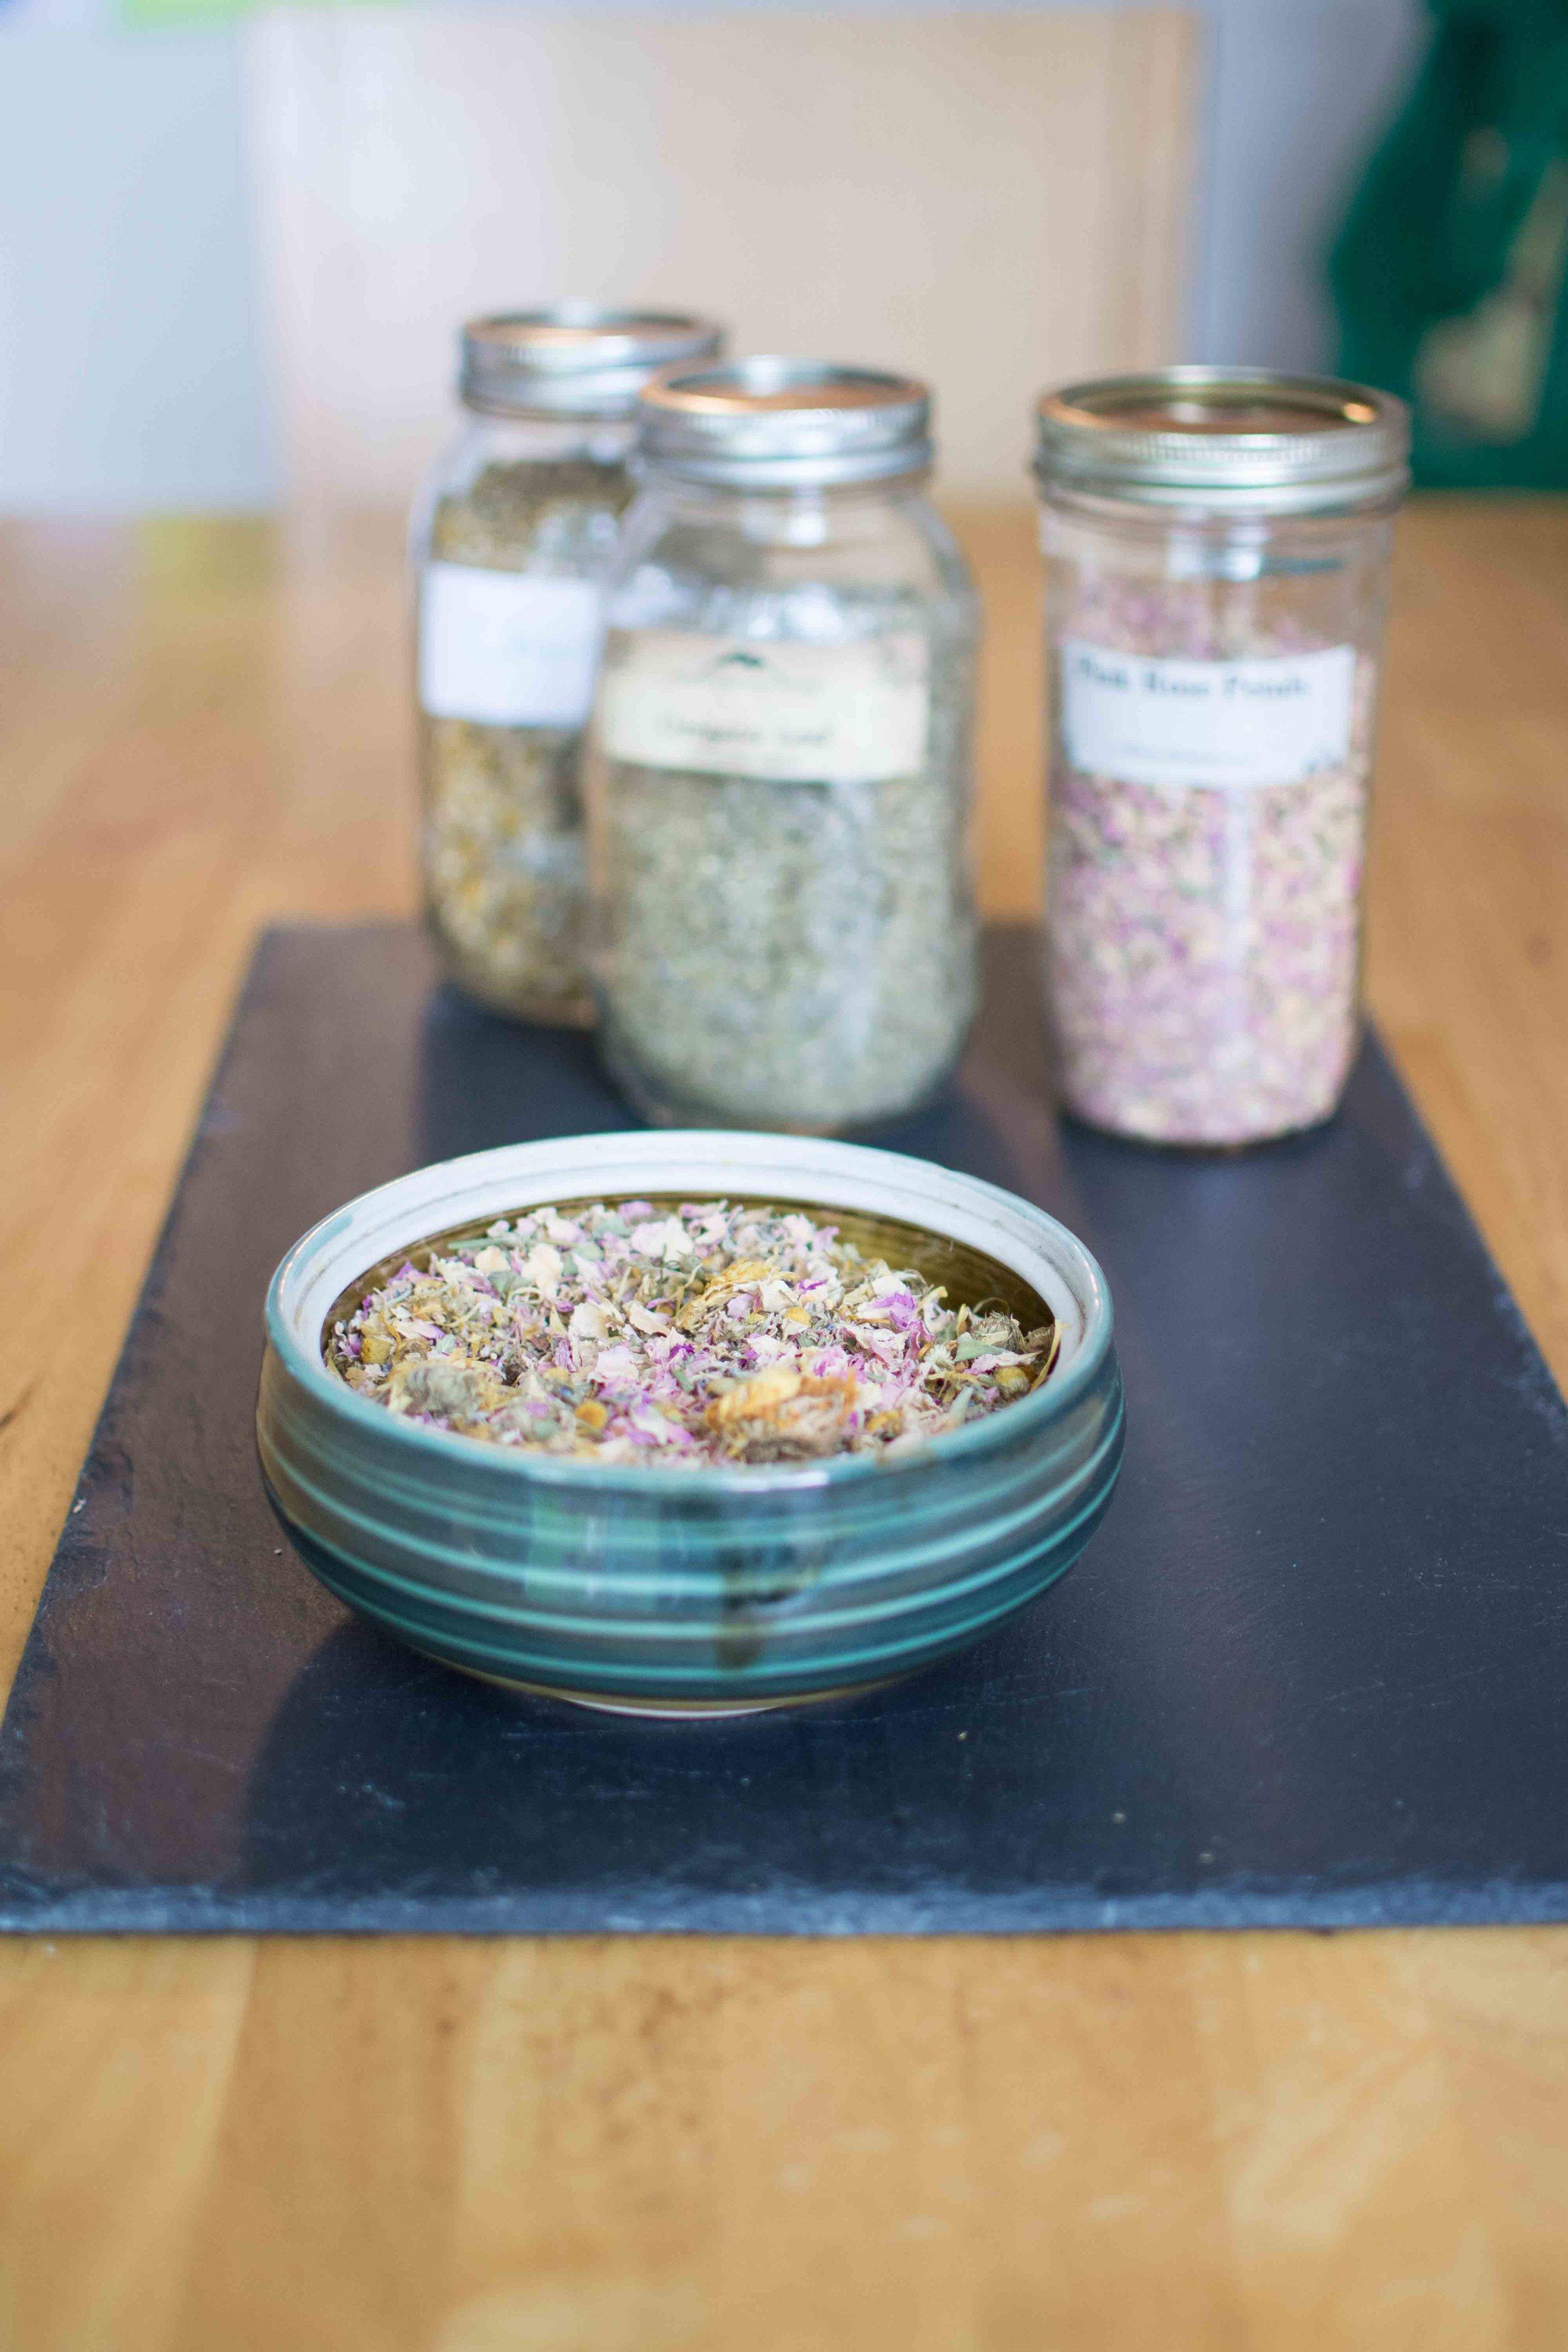 Herbs for Arvigo